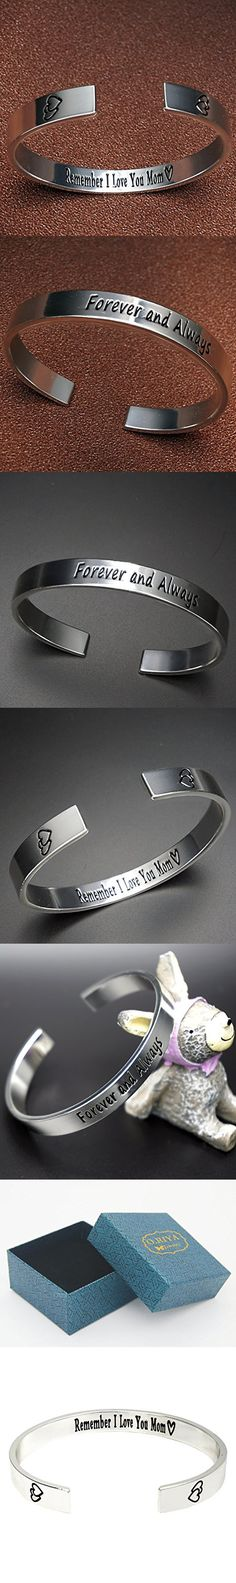 O.RIYA Mother's Day Gift / Gifts For Mom From Daughter - Mother's Bracelet , Birthday Gift , Custom Bracelet , Remember I Love You Mom, Cuff Bracelet , Forever and Always